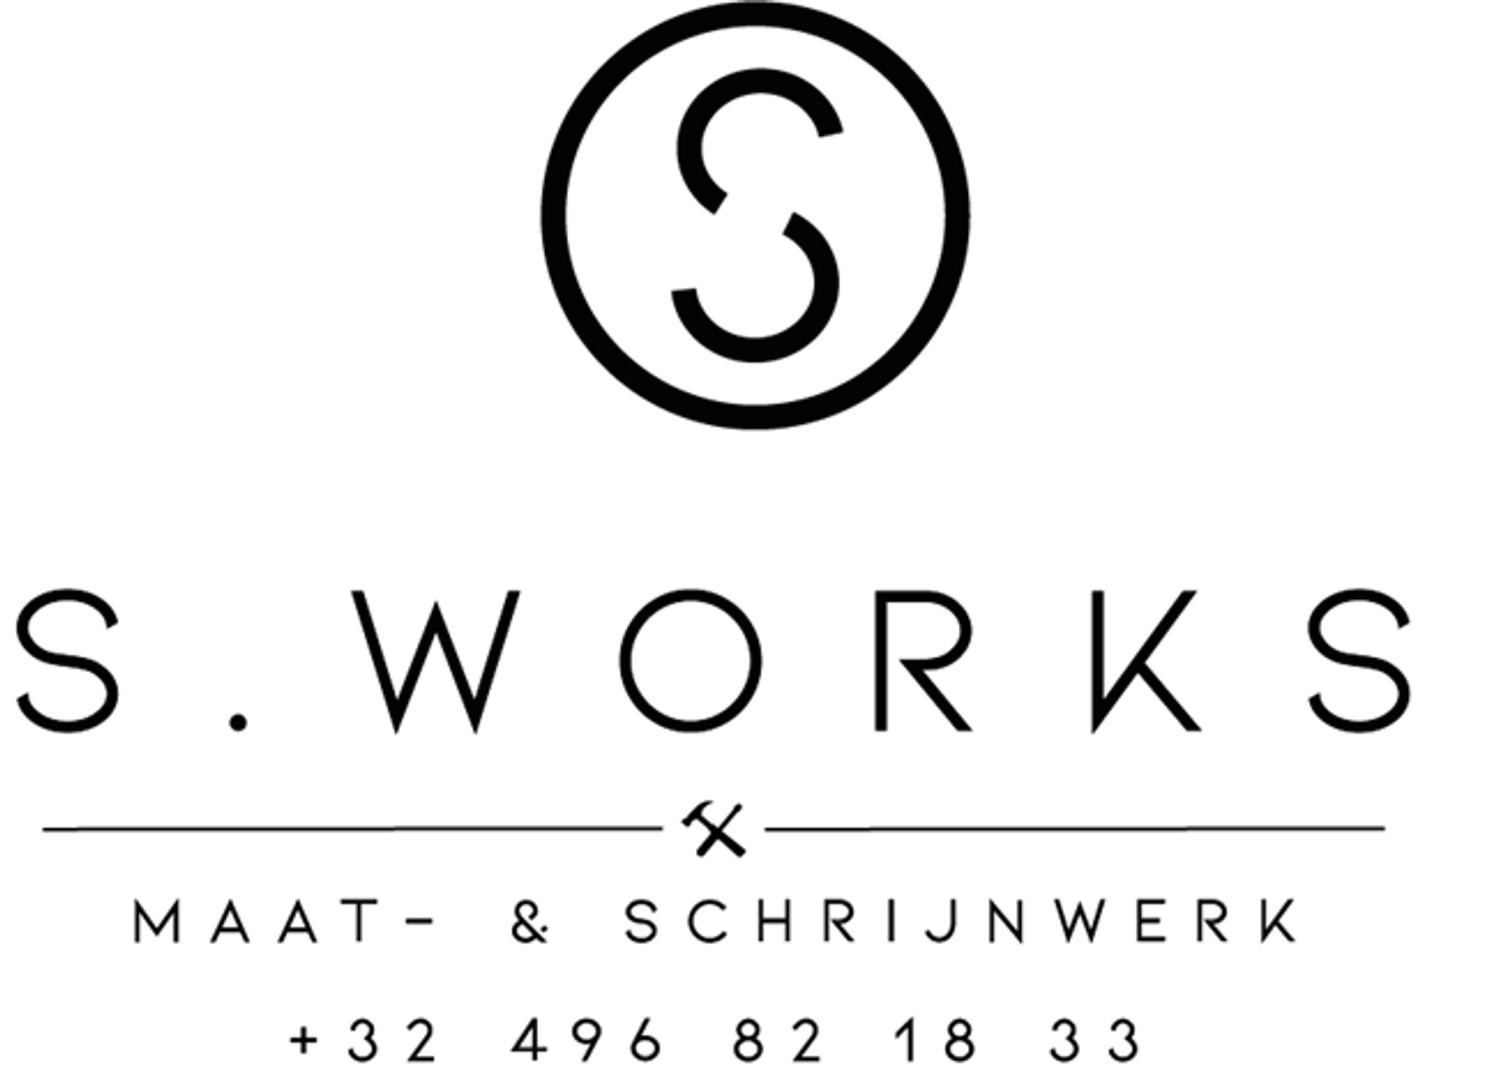 logo S-WORKS